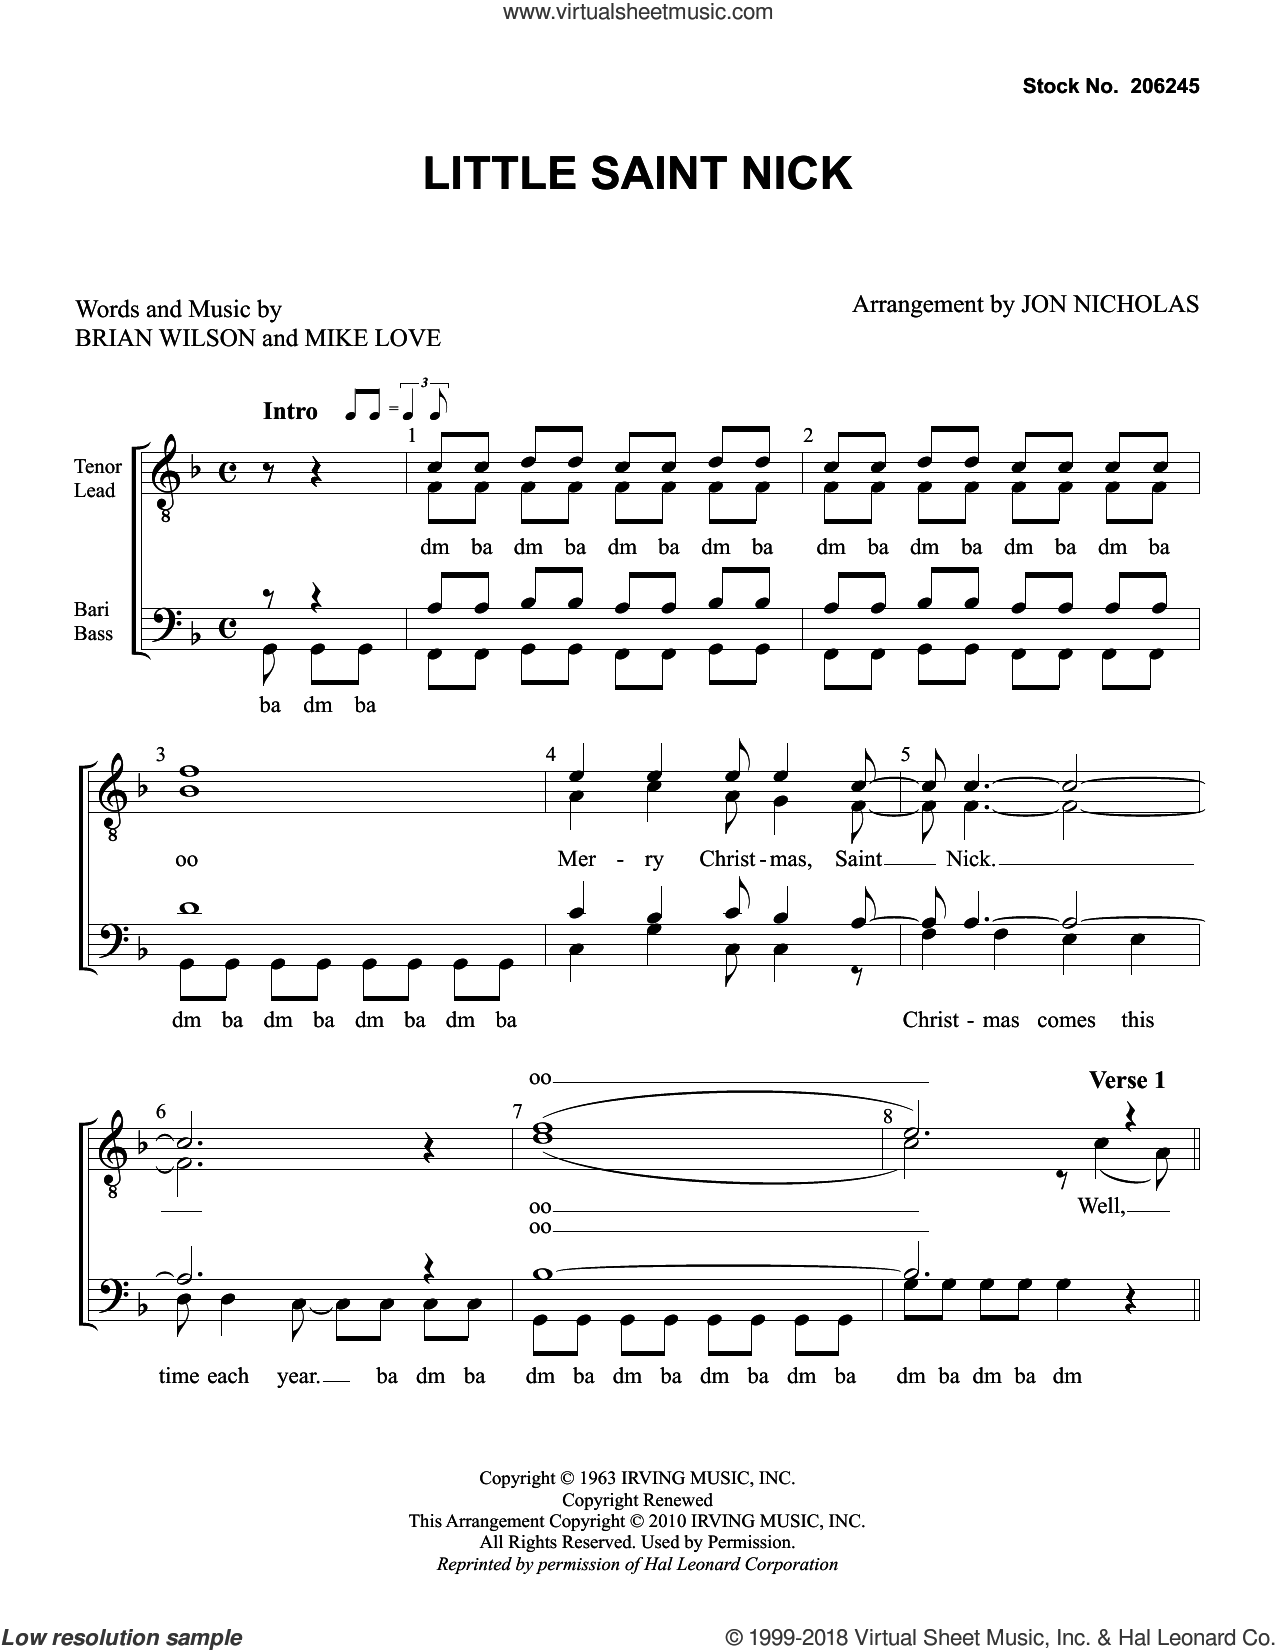 Little Saint Nick (arr. Jon Nicholas) sheet music for choir (TTBB: tenor, bass) by The Beach Boys, Jon Nicholas, Brian Wilson and Mike Love, intermediate skill level